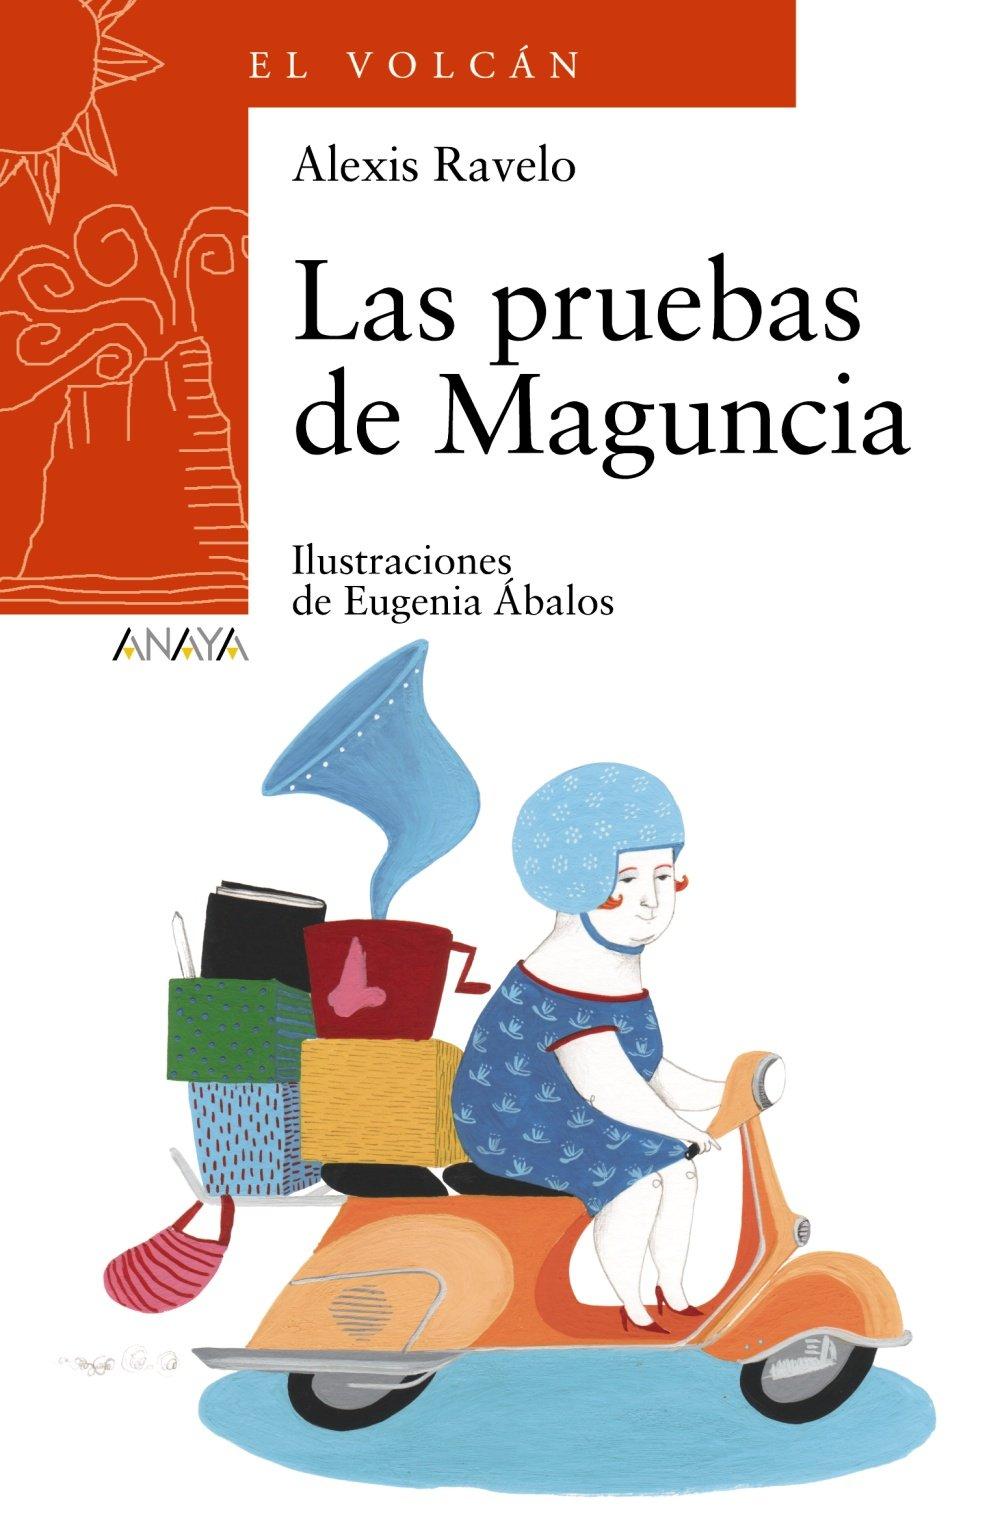 Las pruebas de Maguncia: Alexis Ravelo Betancor ...